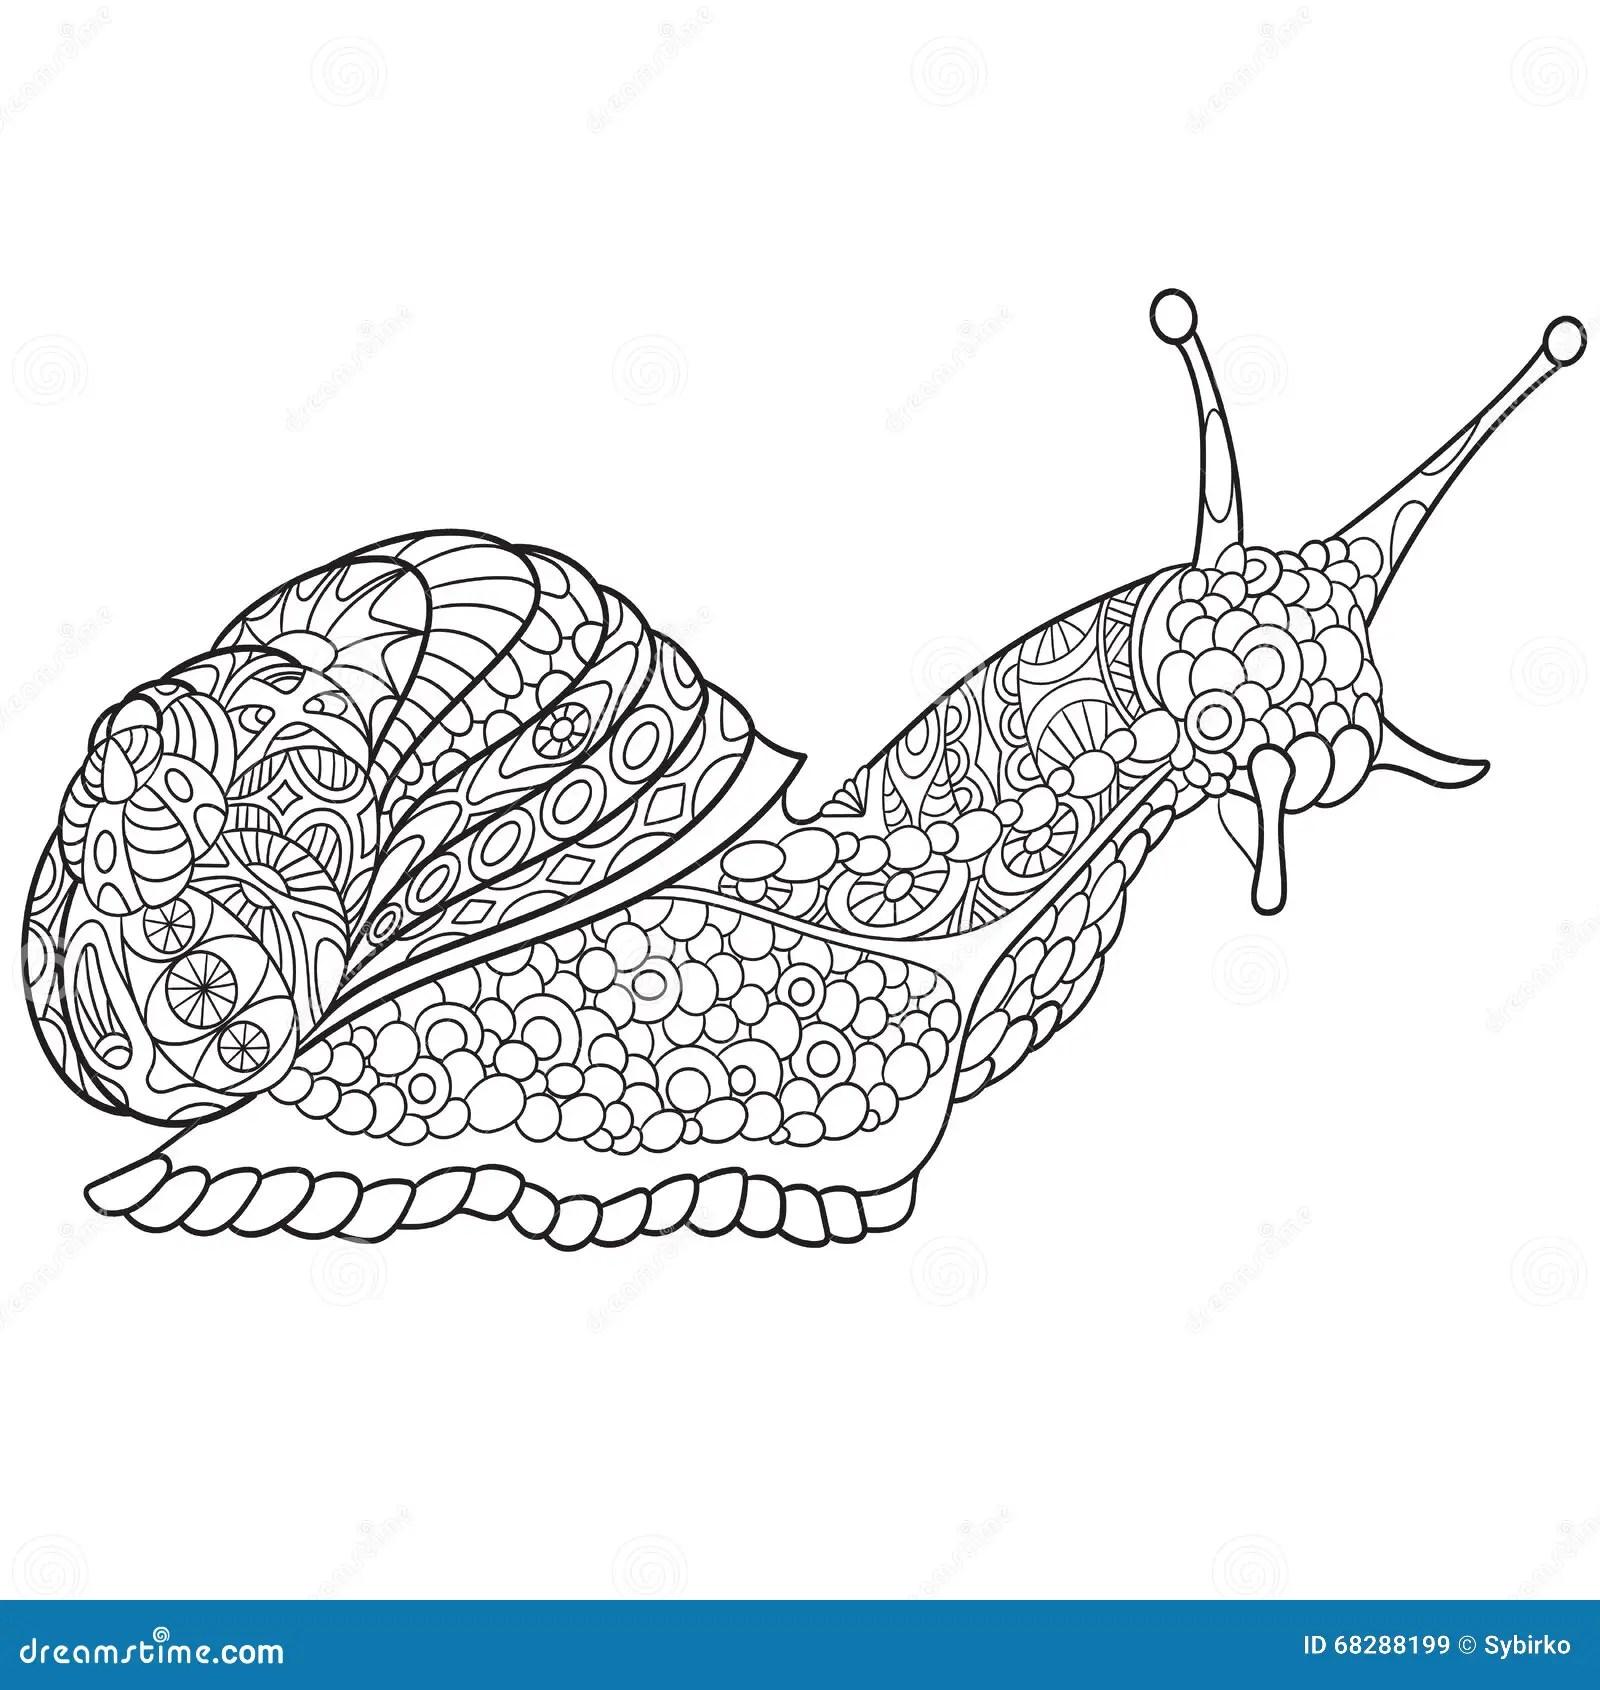 Zentangle Stylized Snail Cartoon Vector